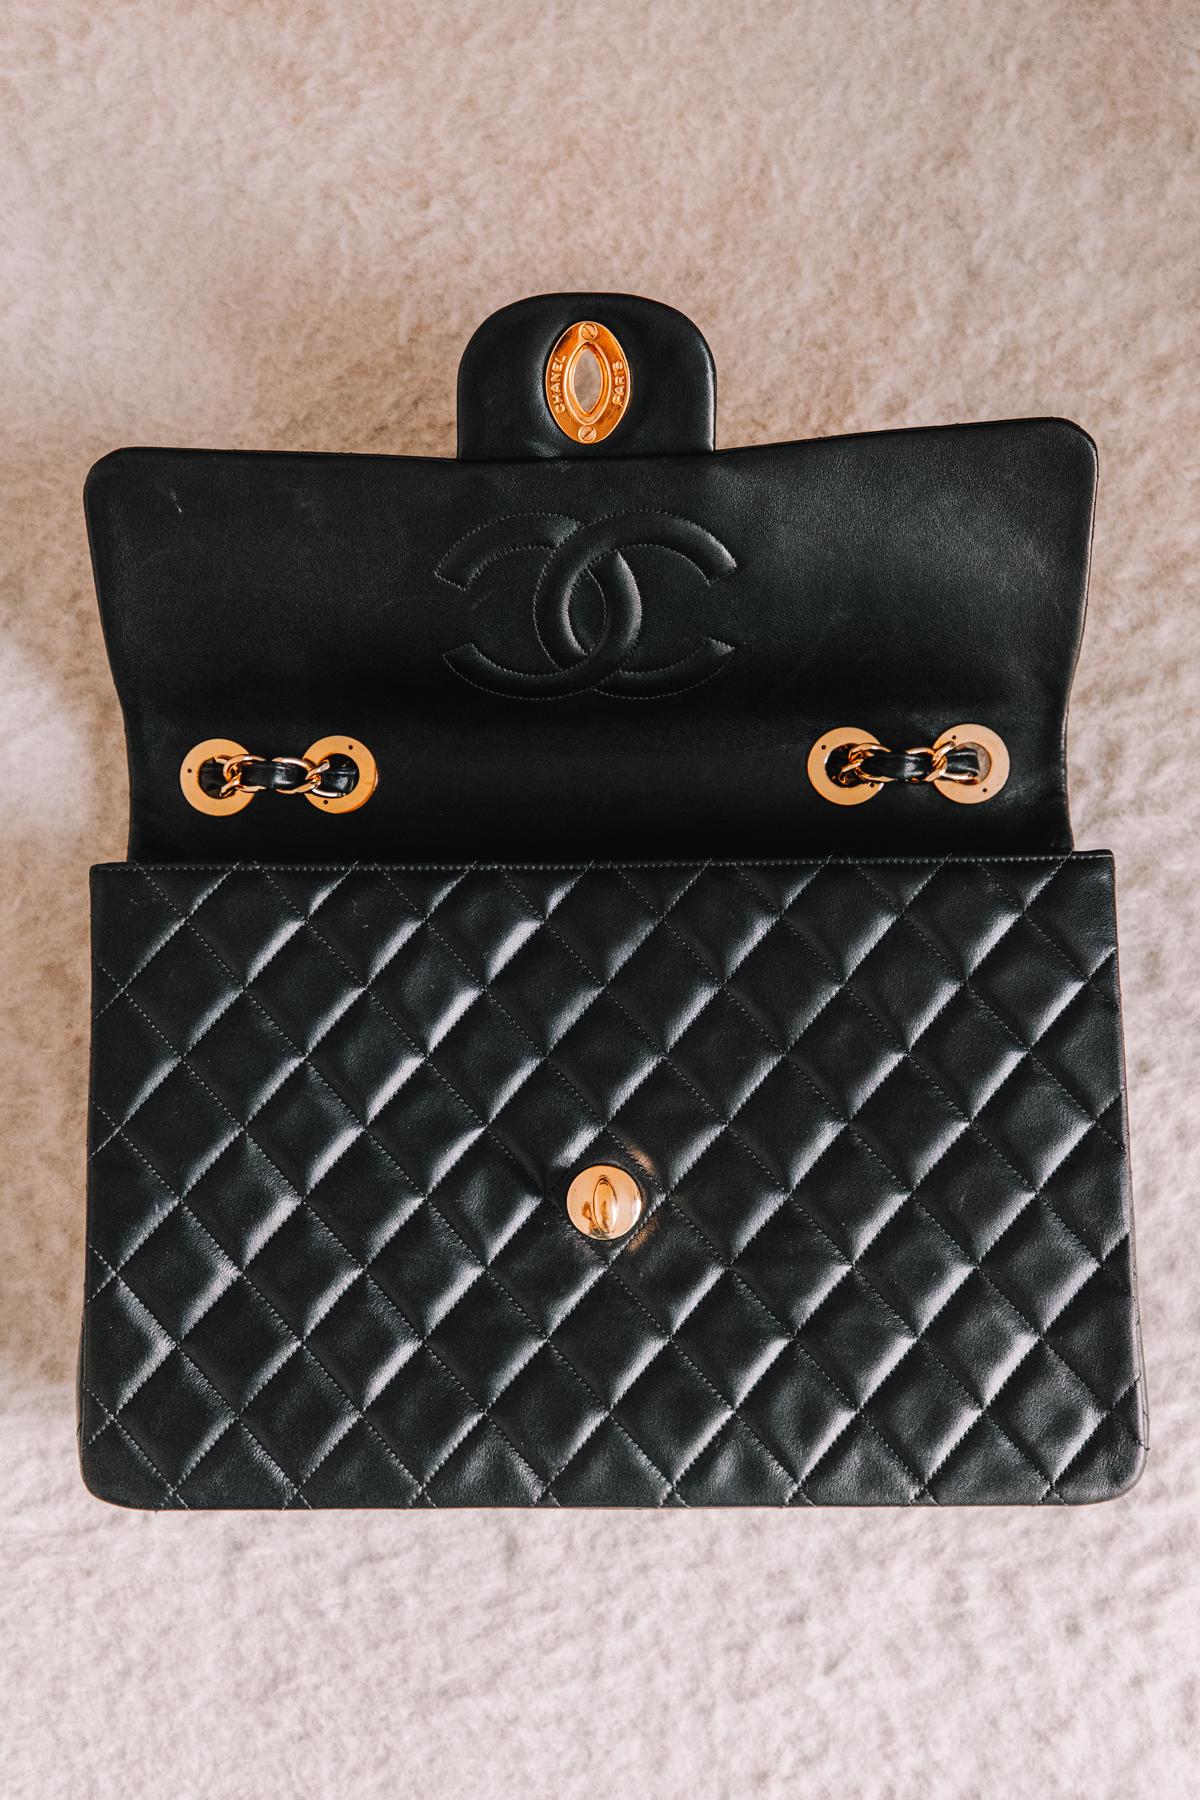 Fashion Jackson CHANEL Lambskin Quilted XL Jumbo Single Flap Black